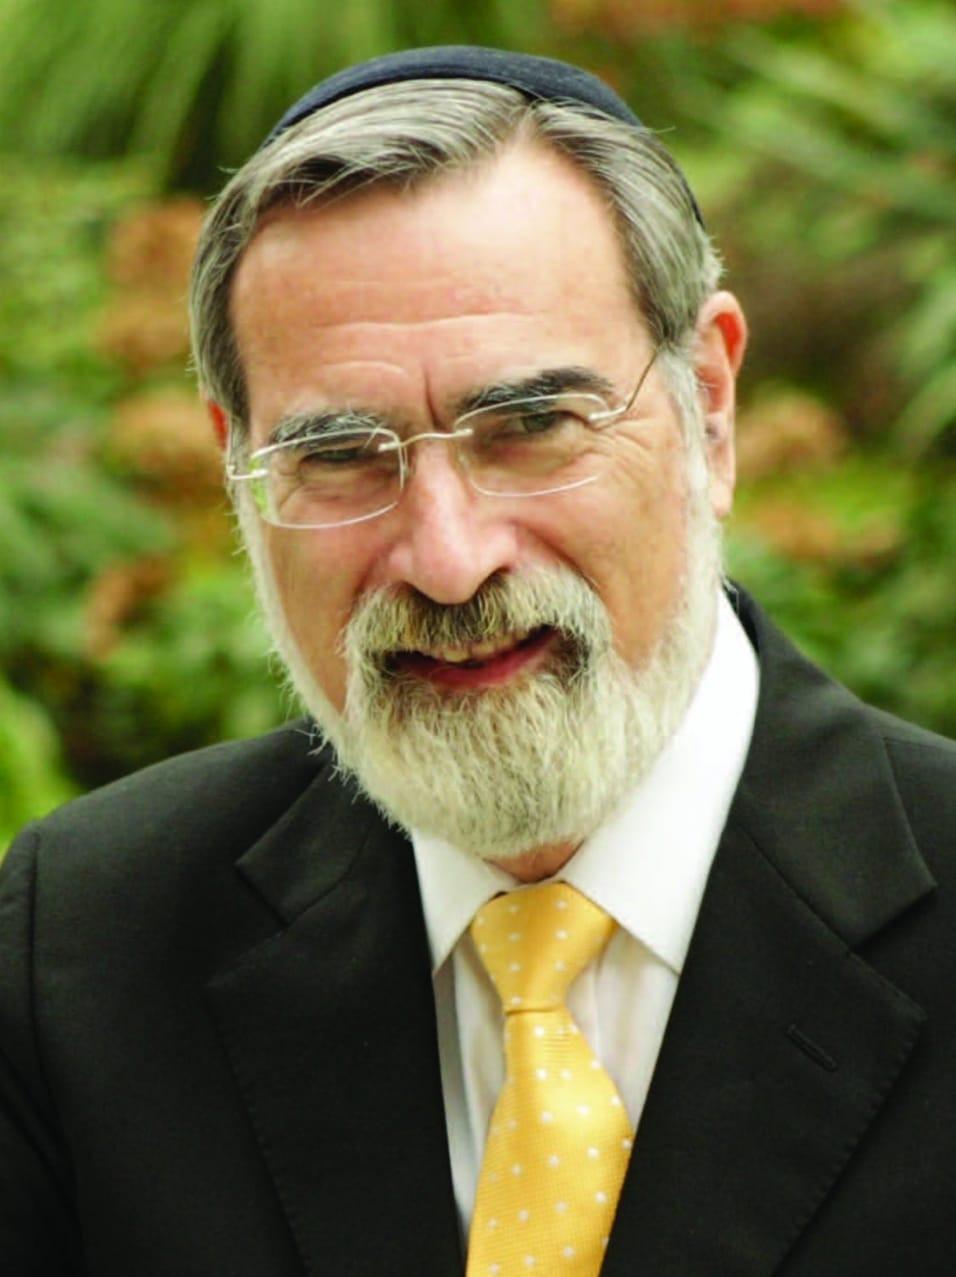 Judaísmo - Falecimento do Baruch Dayan Ha'Emet